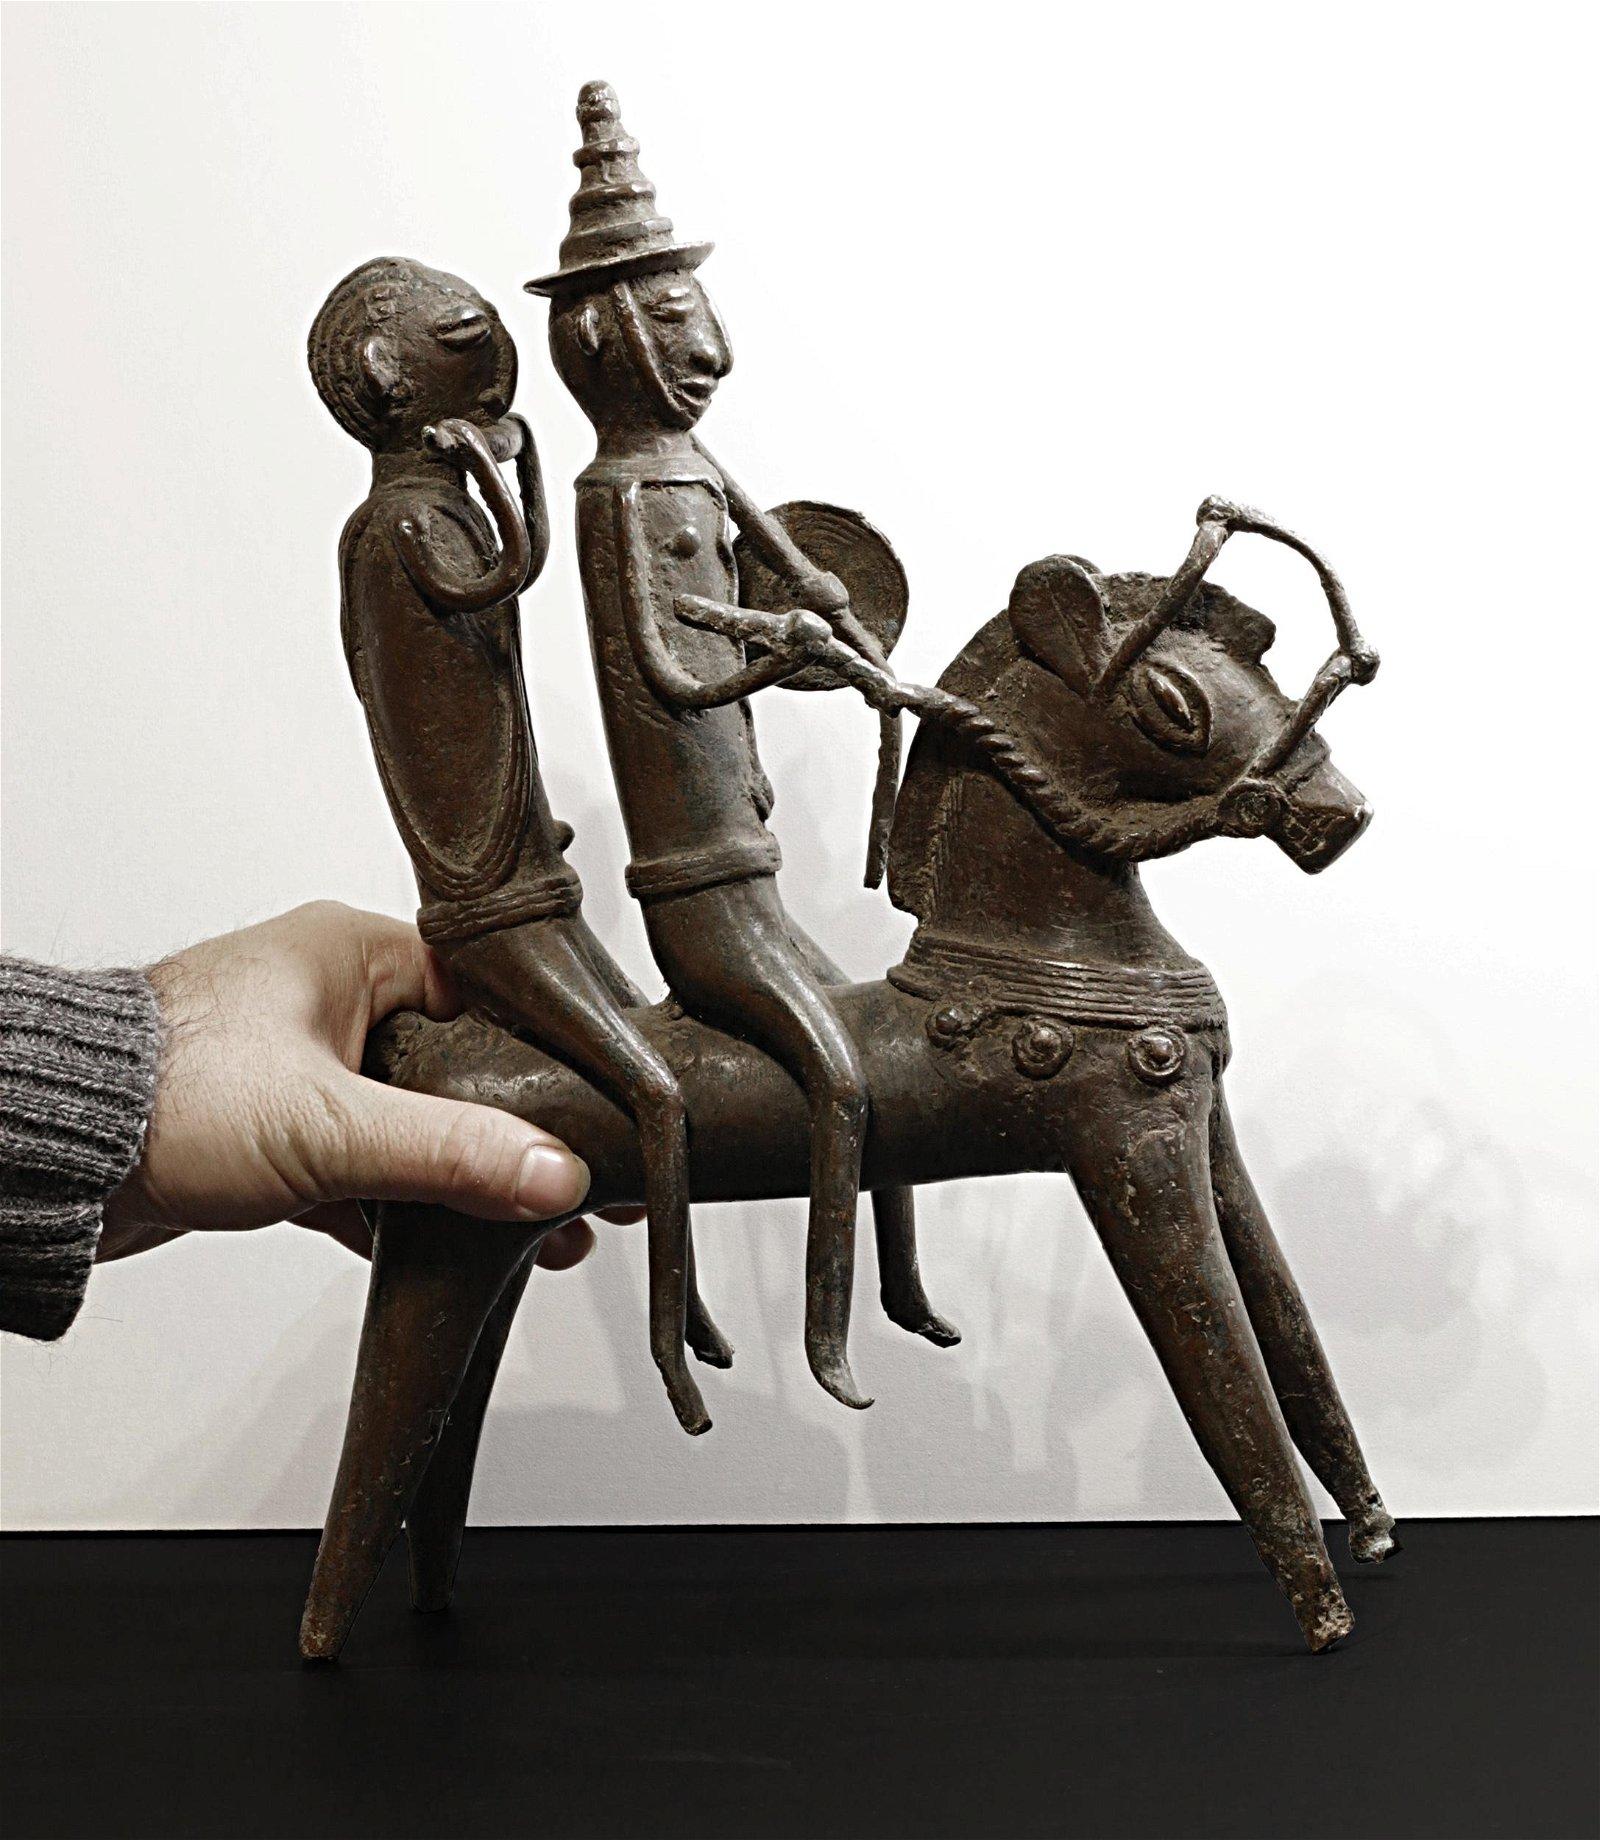 Benin Yoruba People 1850 Bronze Statue of horseman and